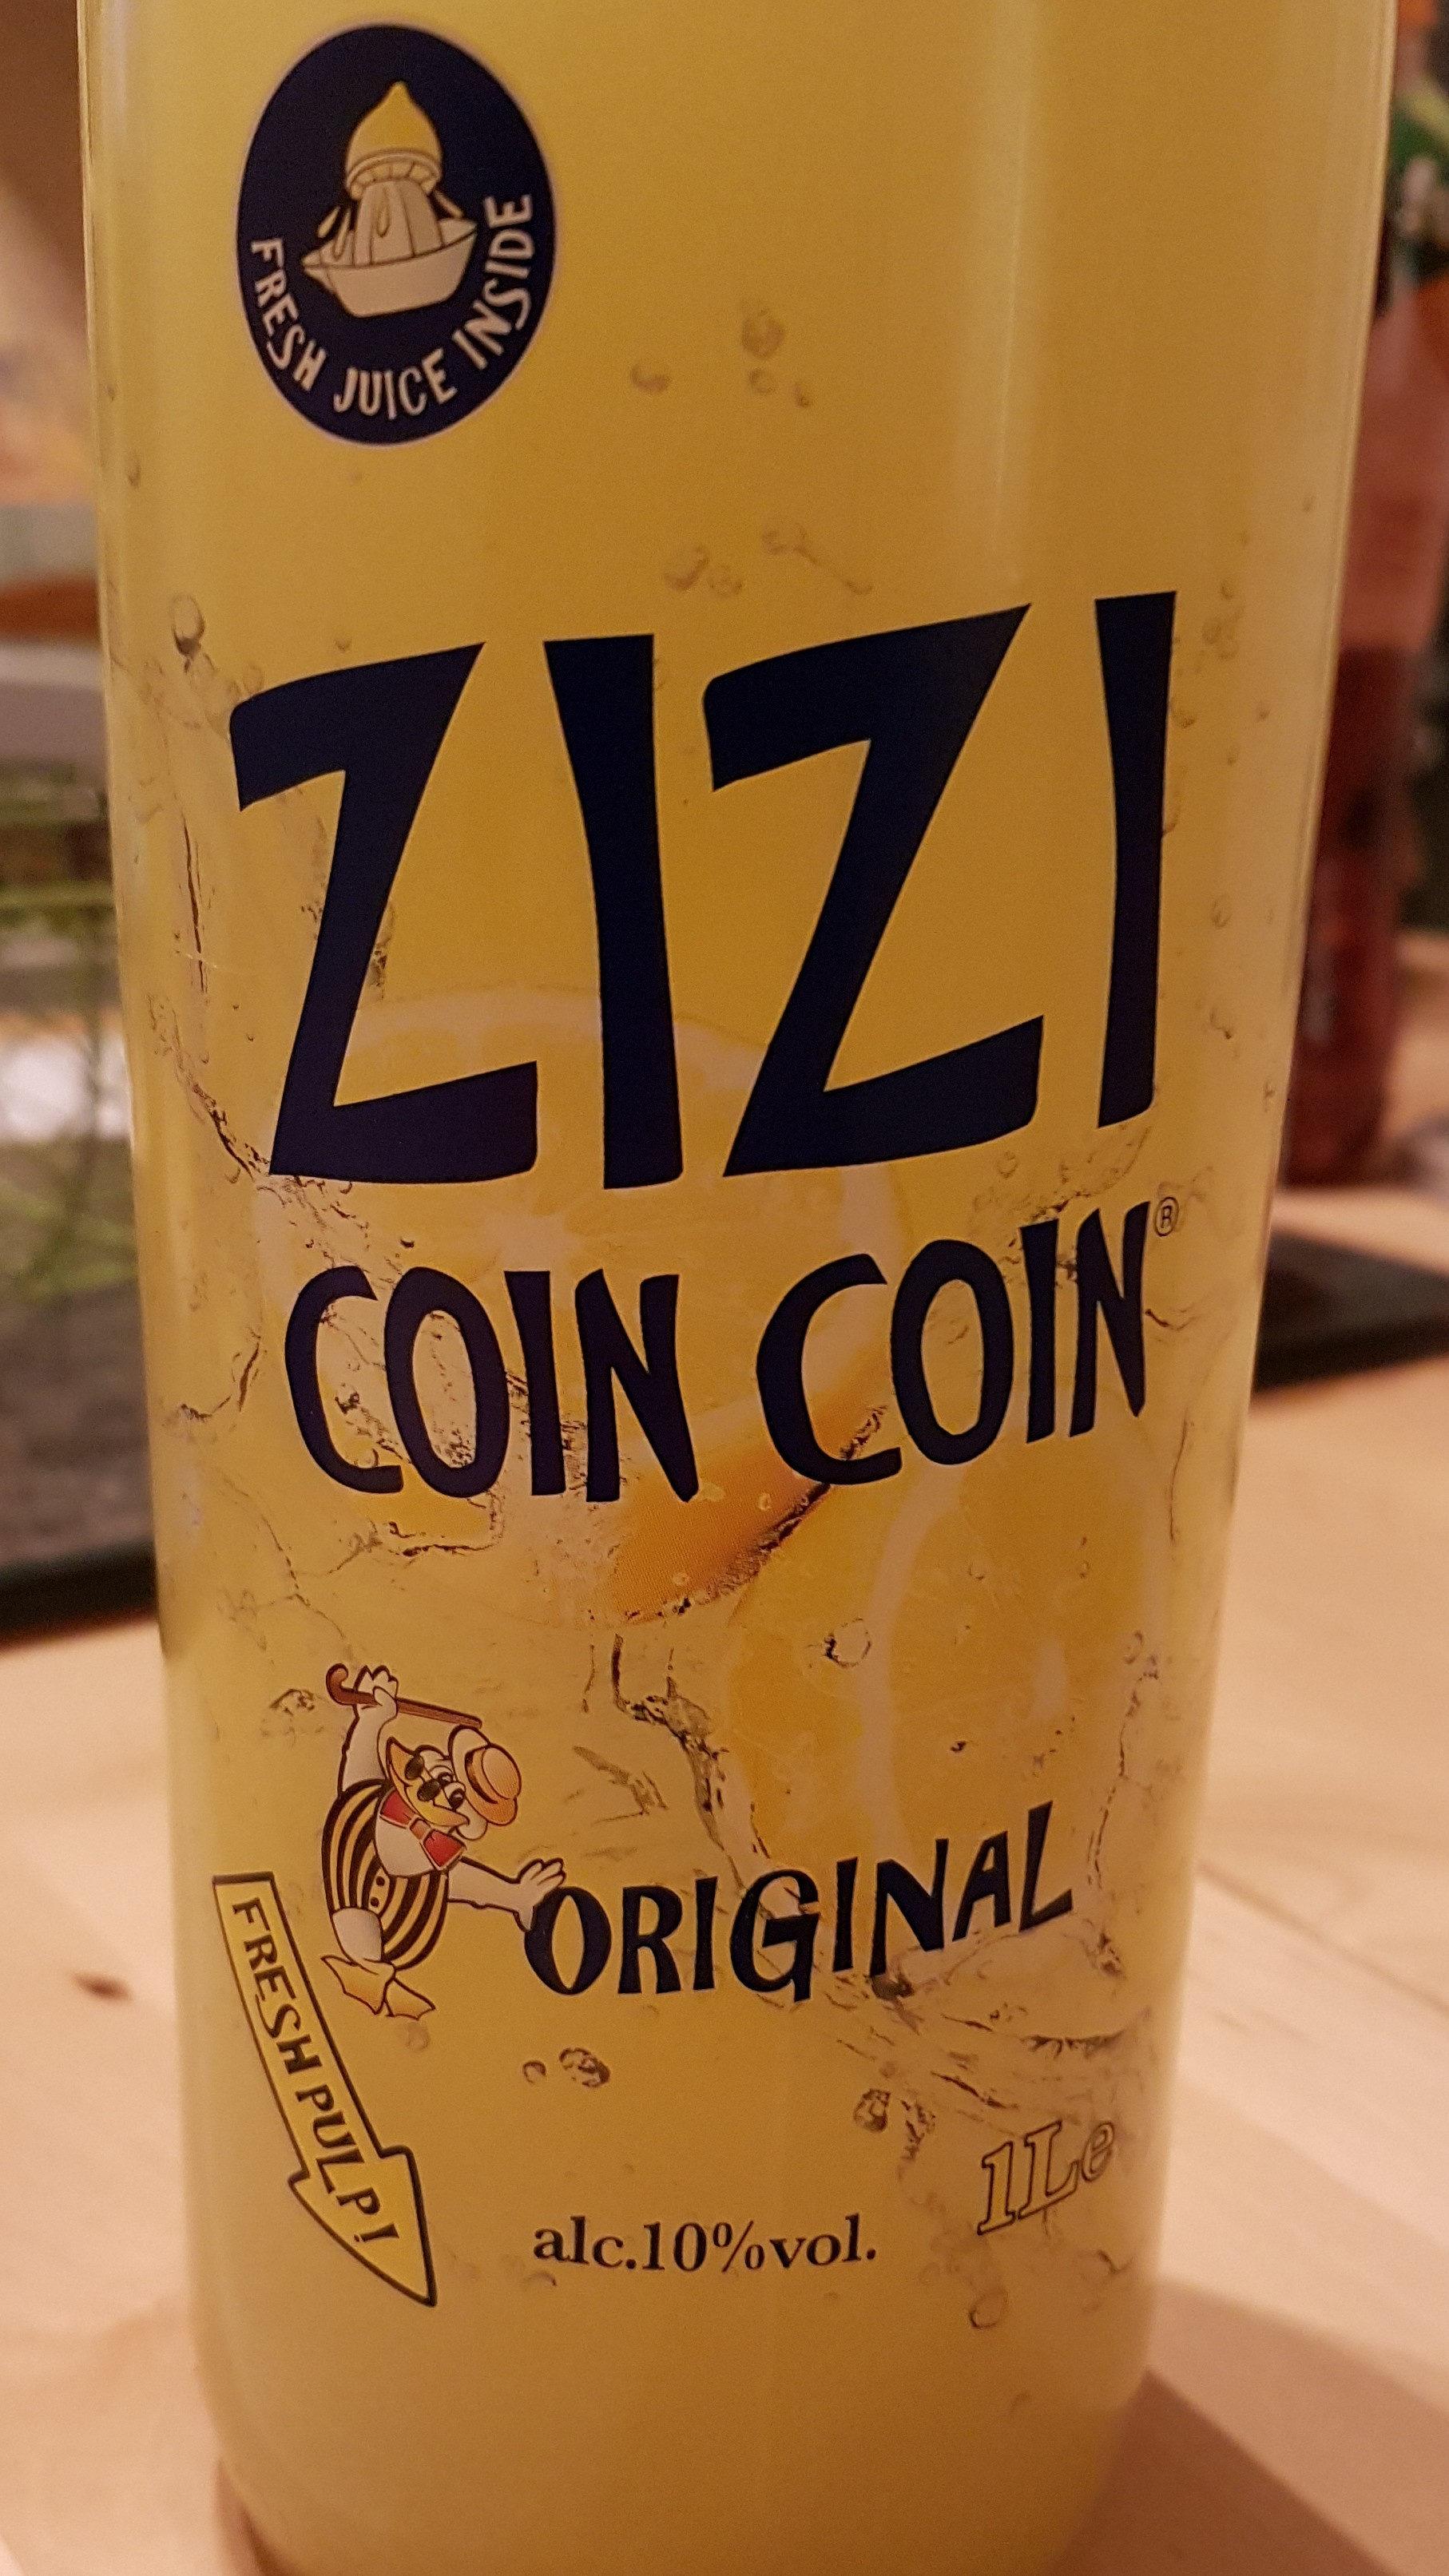 ZiZi coin coin - Product - fr